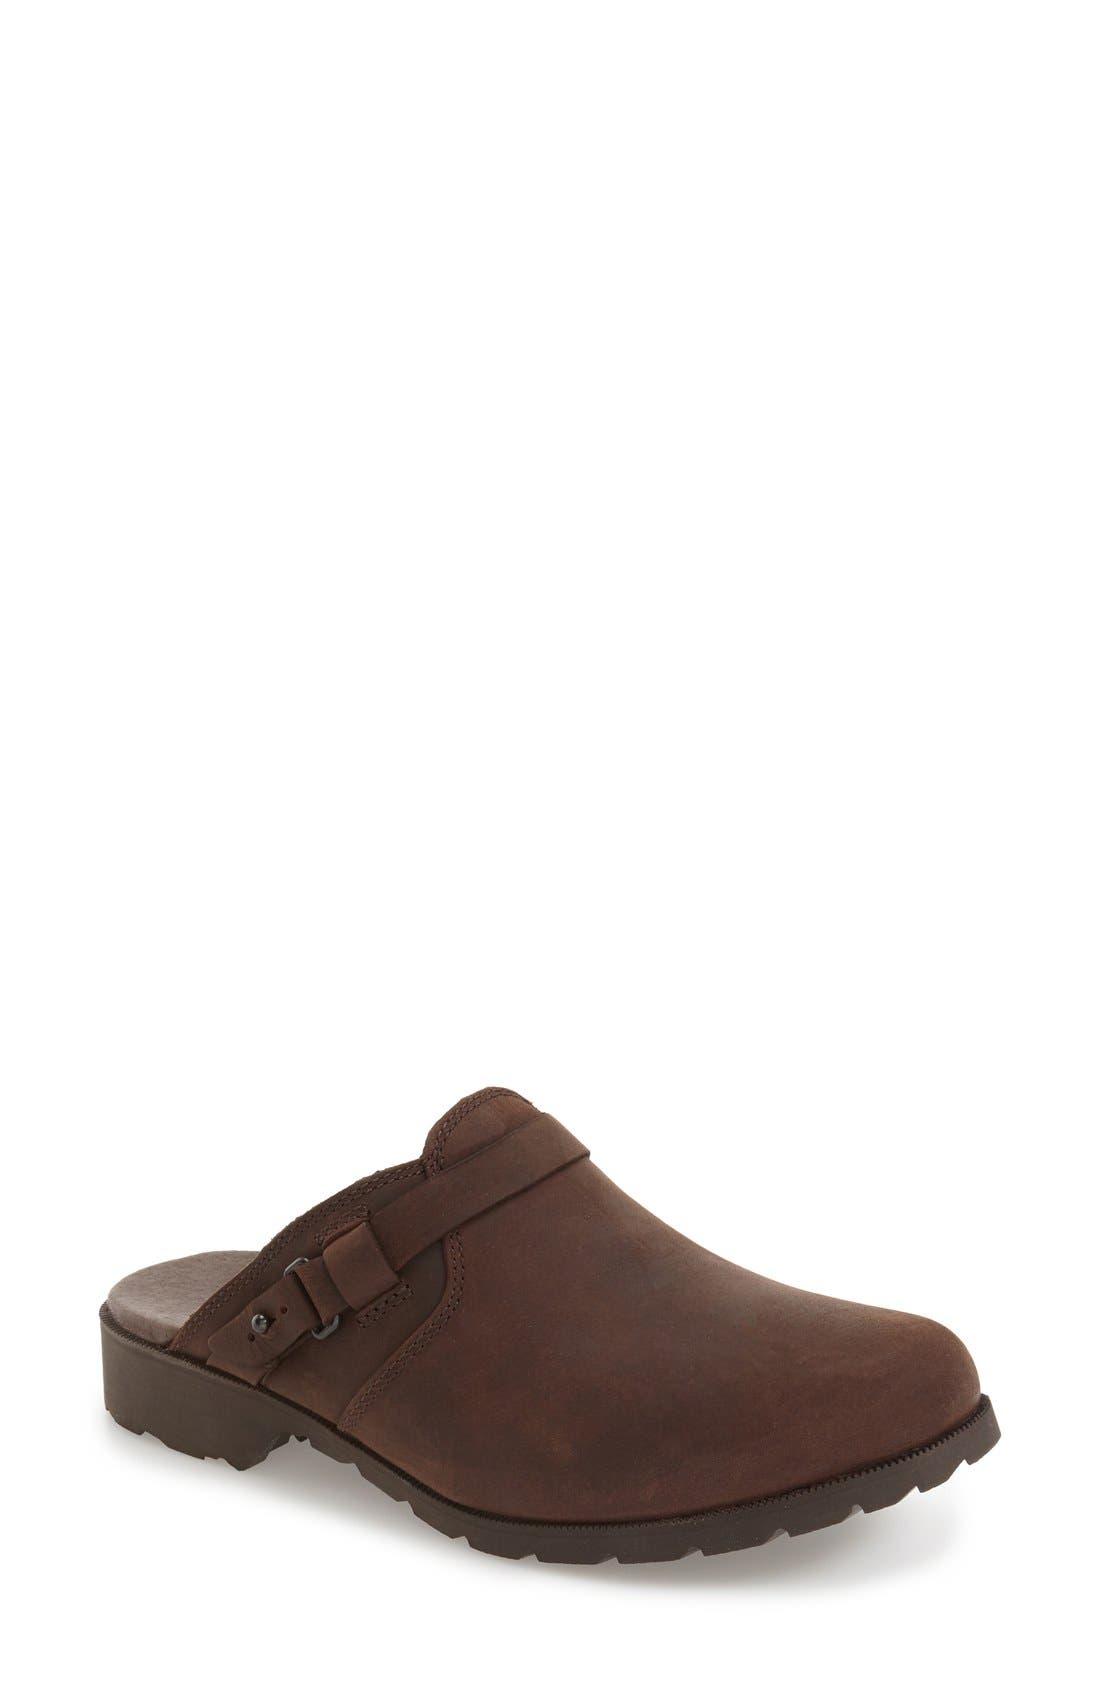 Delavina Clog,                         Main,                         color, Dark Brown Leather